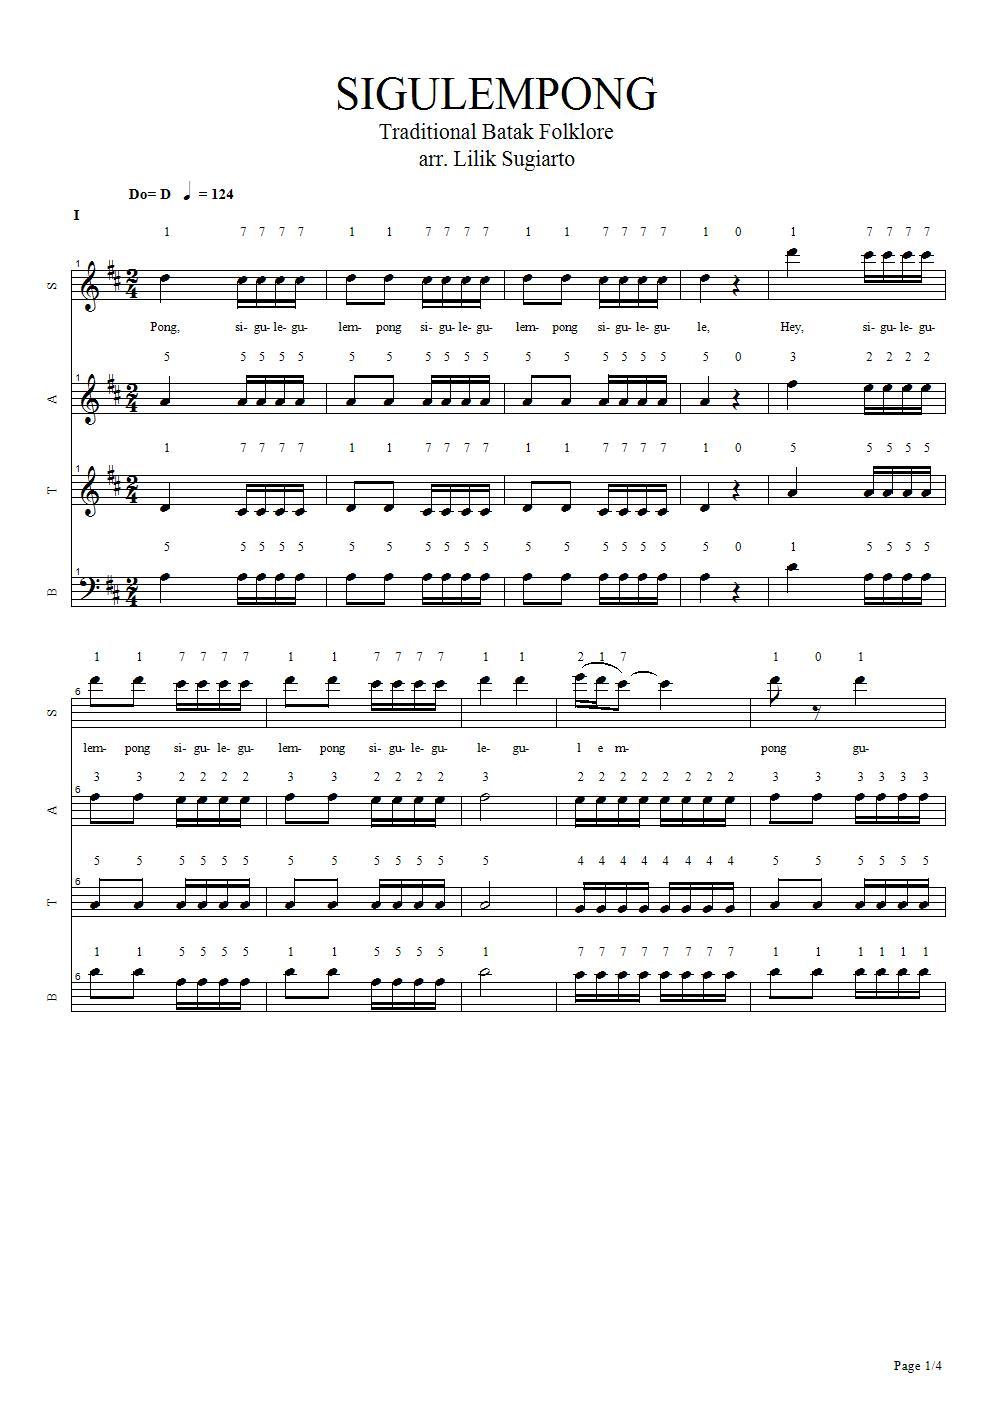 Lirik Lagu Sigulempong : lirik, sigulempong, Dareh, Sigulempong,